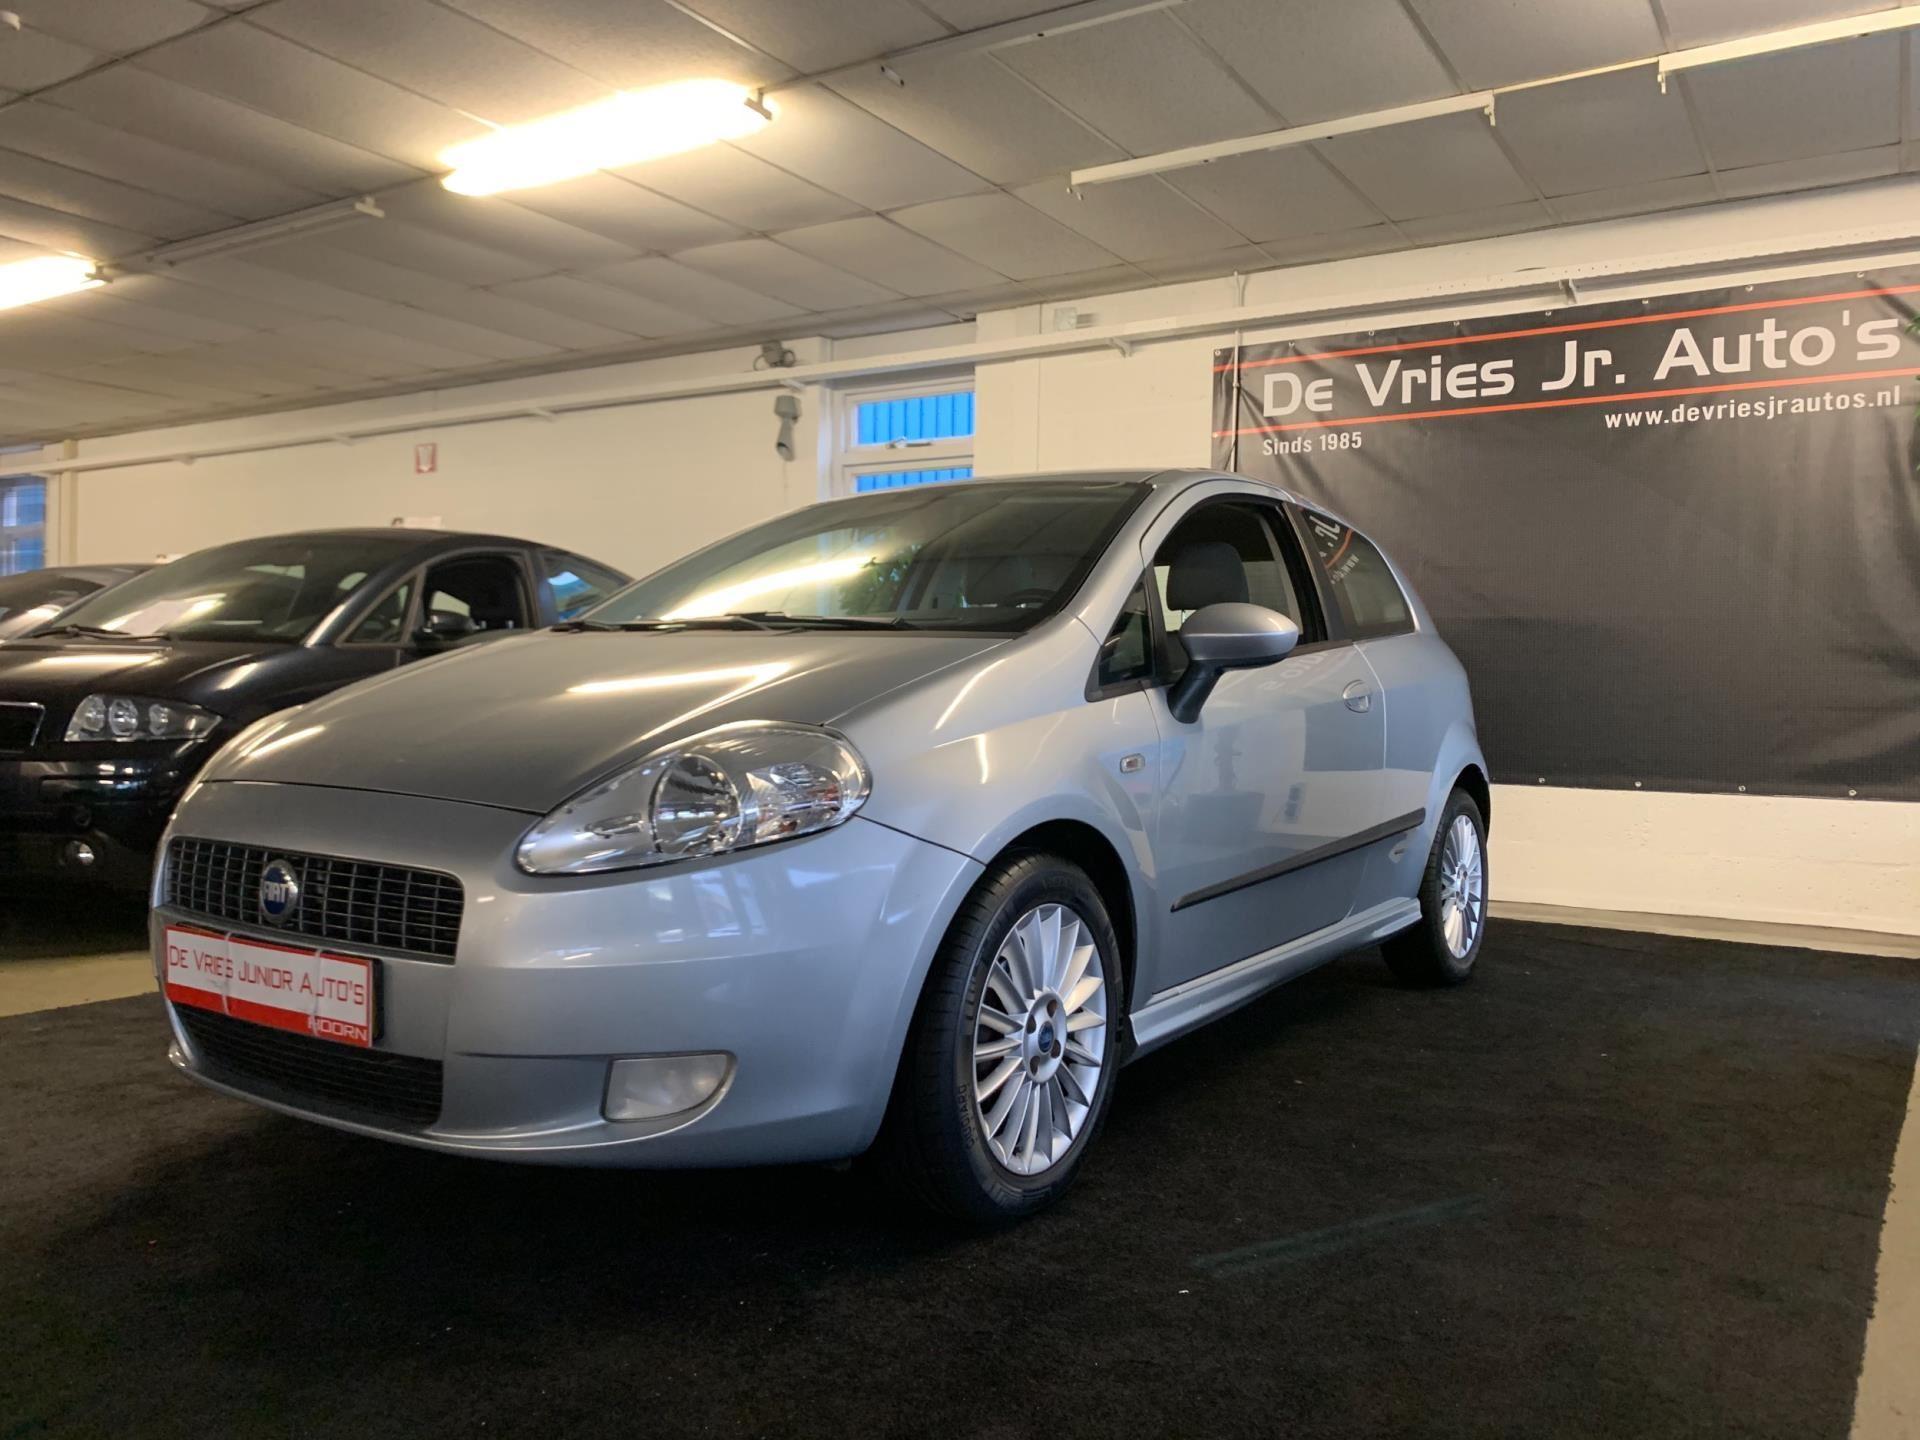 Fiat Grande Punto occasion - De Vries Junior Auto's